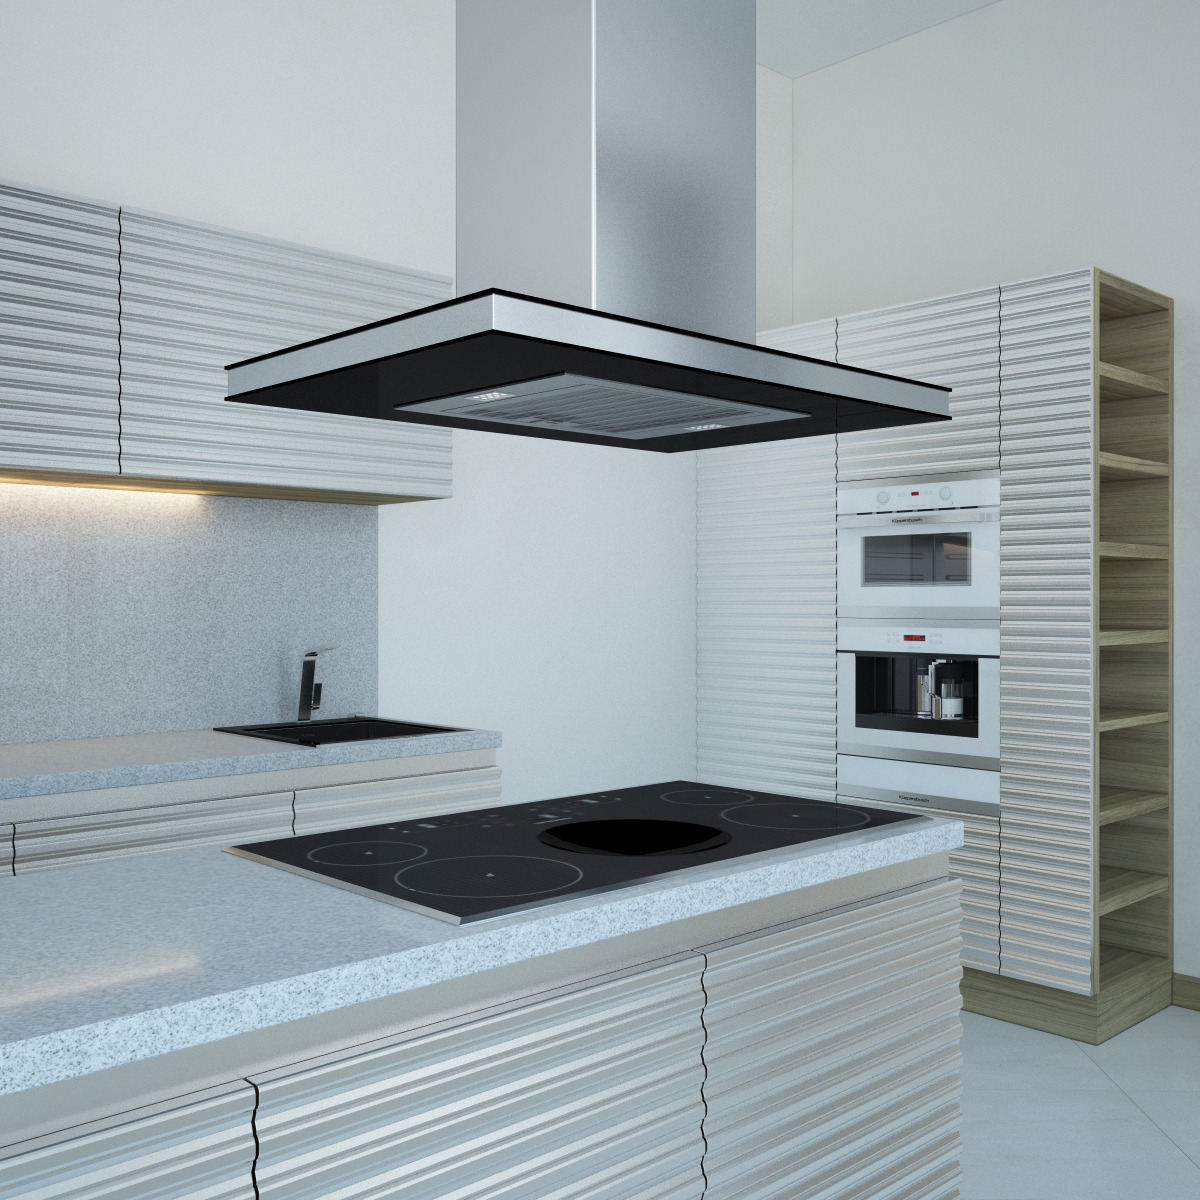 Kitchen Furniture and Appliances Kuppersbusch by Genkot29   3DOcean